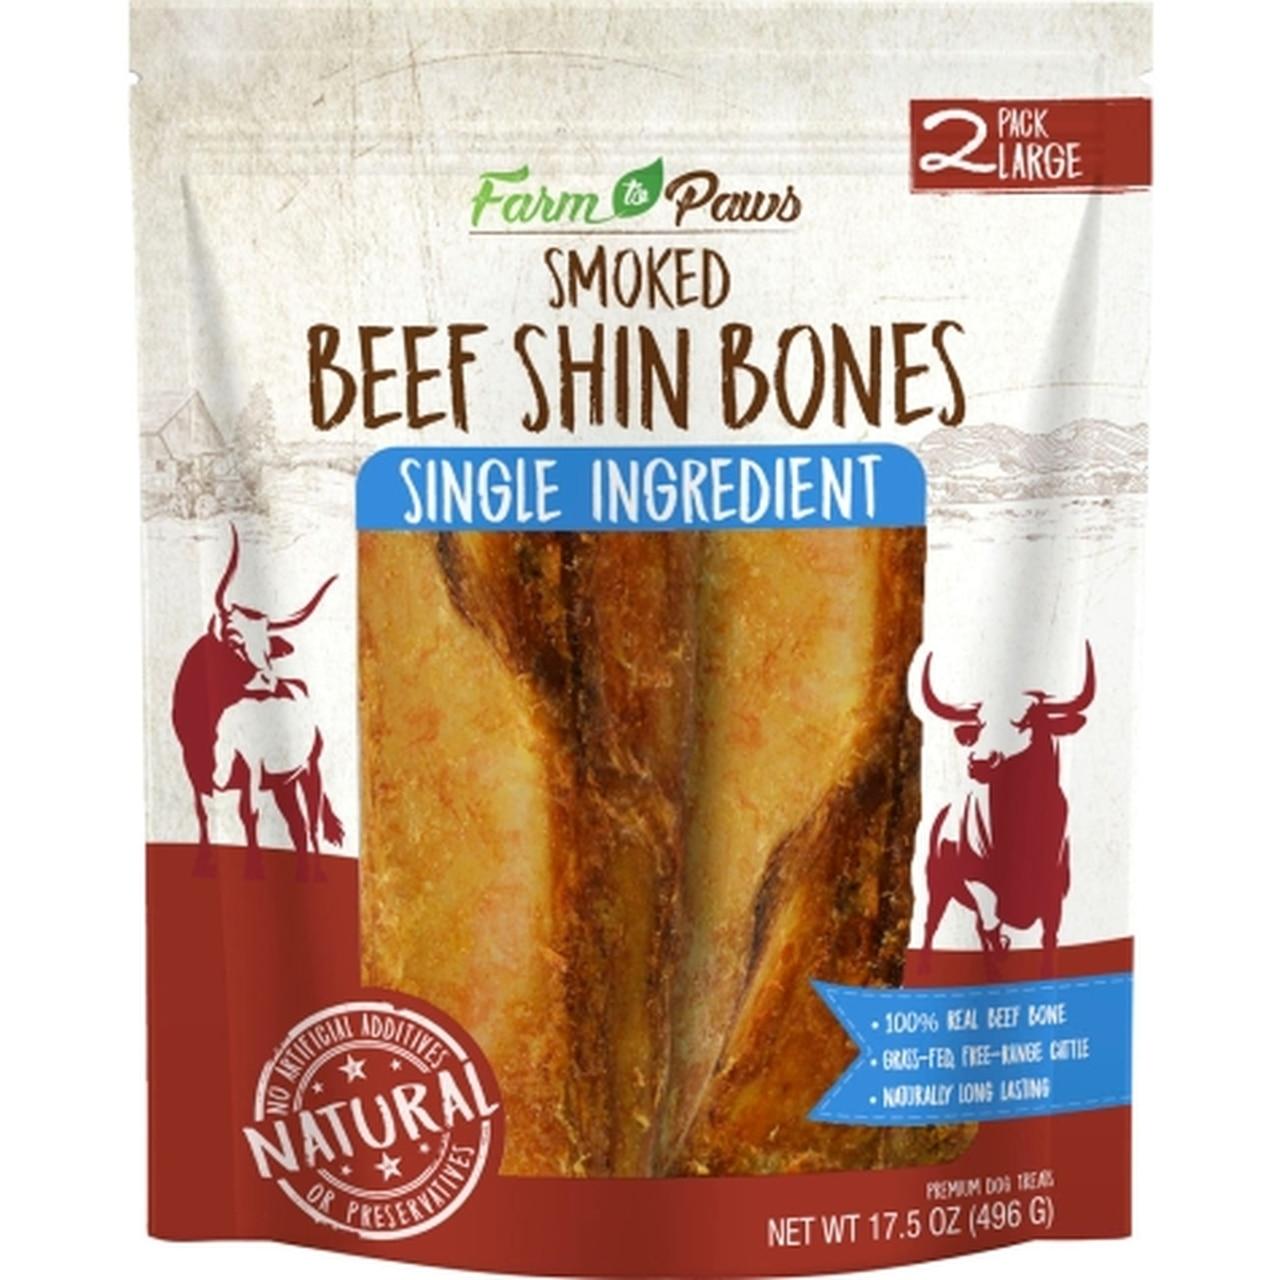 Farm to Paws Smoked Shin Bones Dog Treats, Large, 2-pk